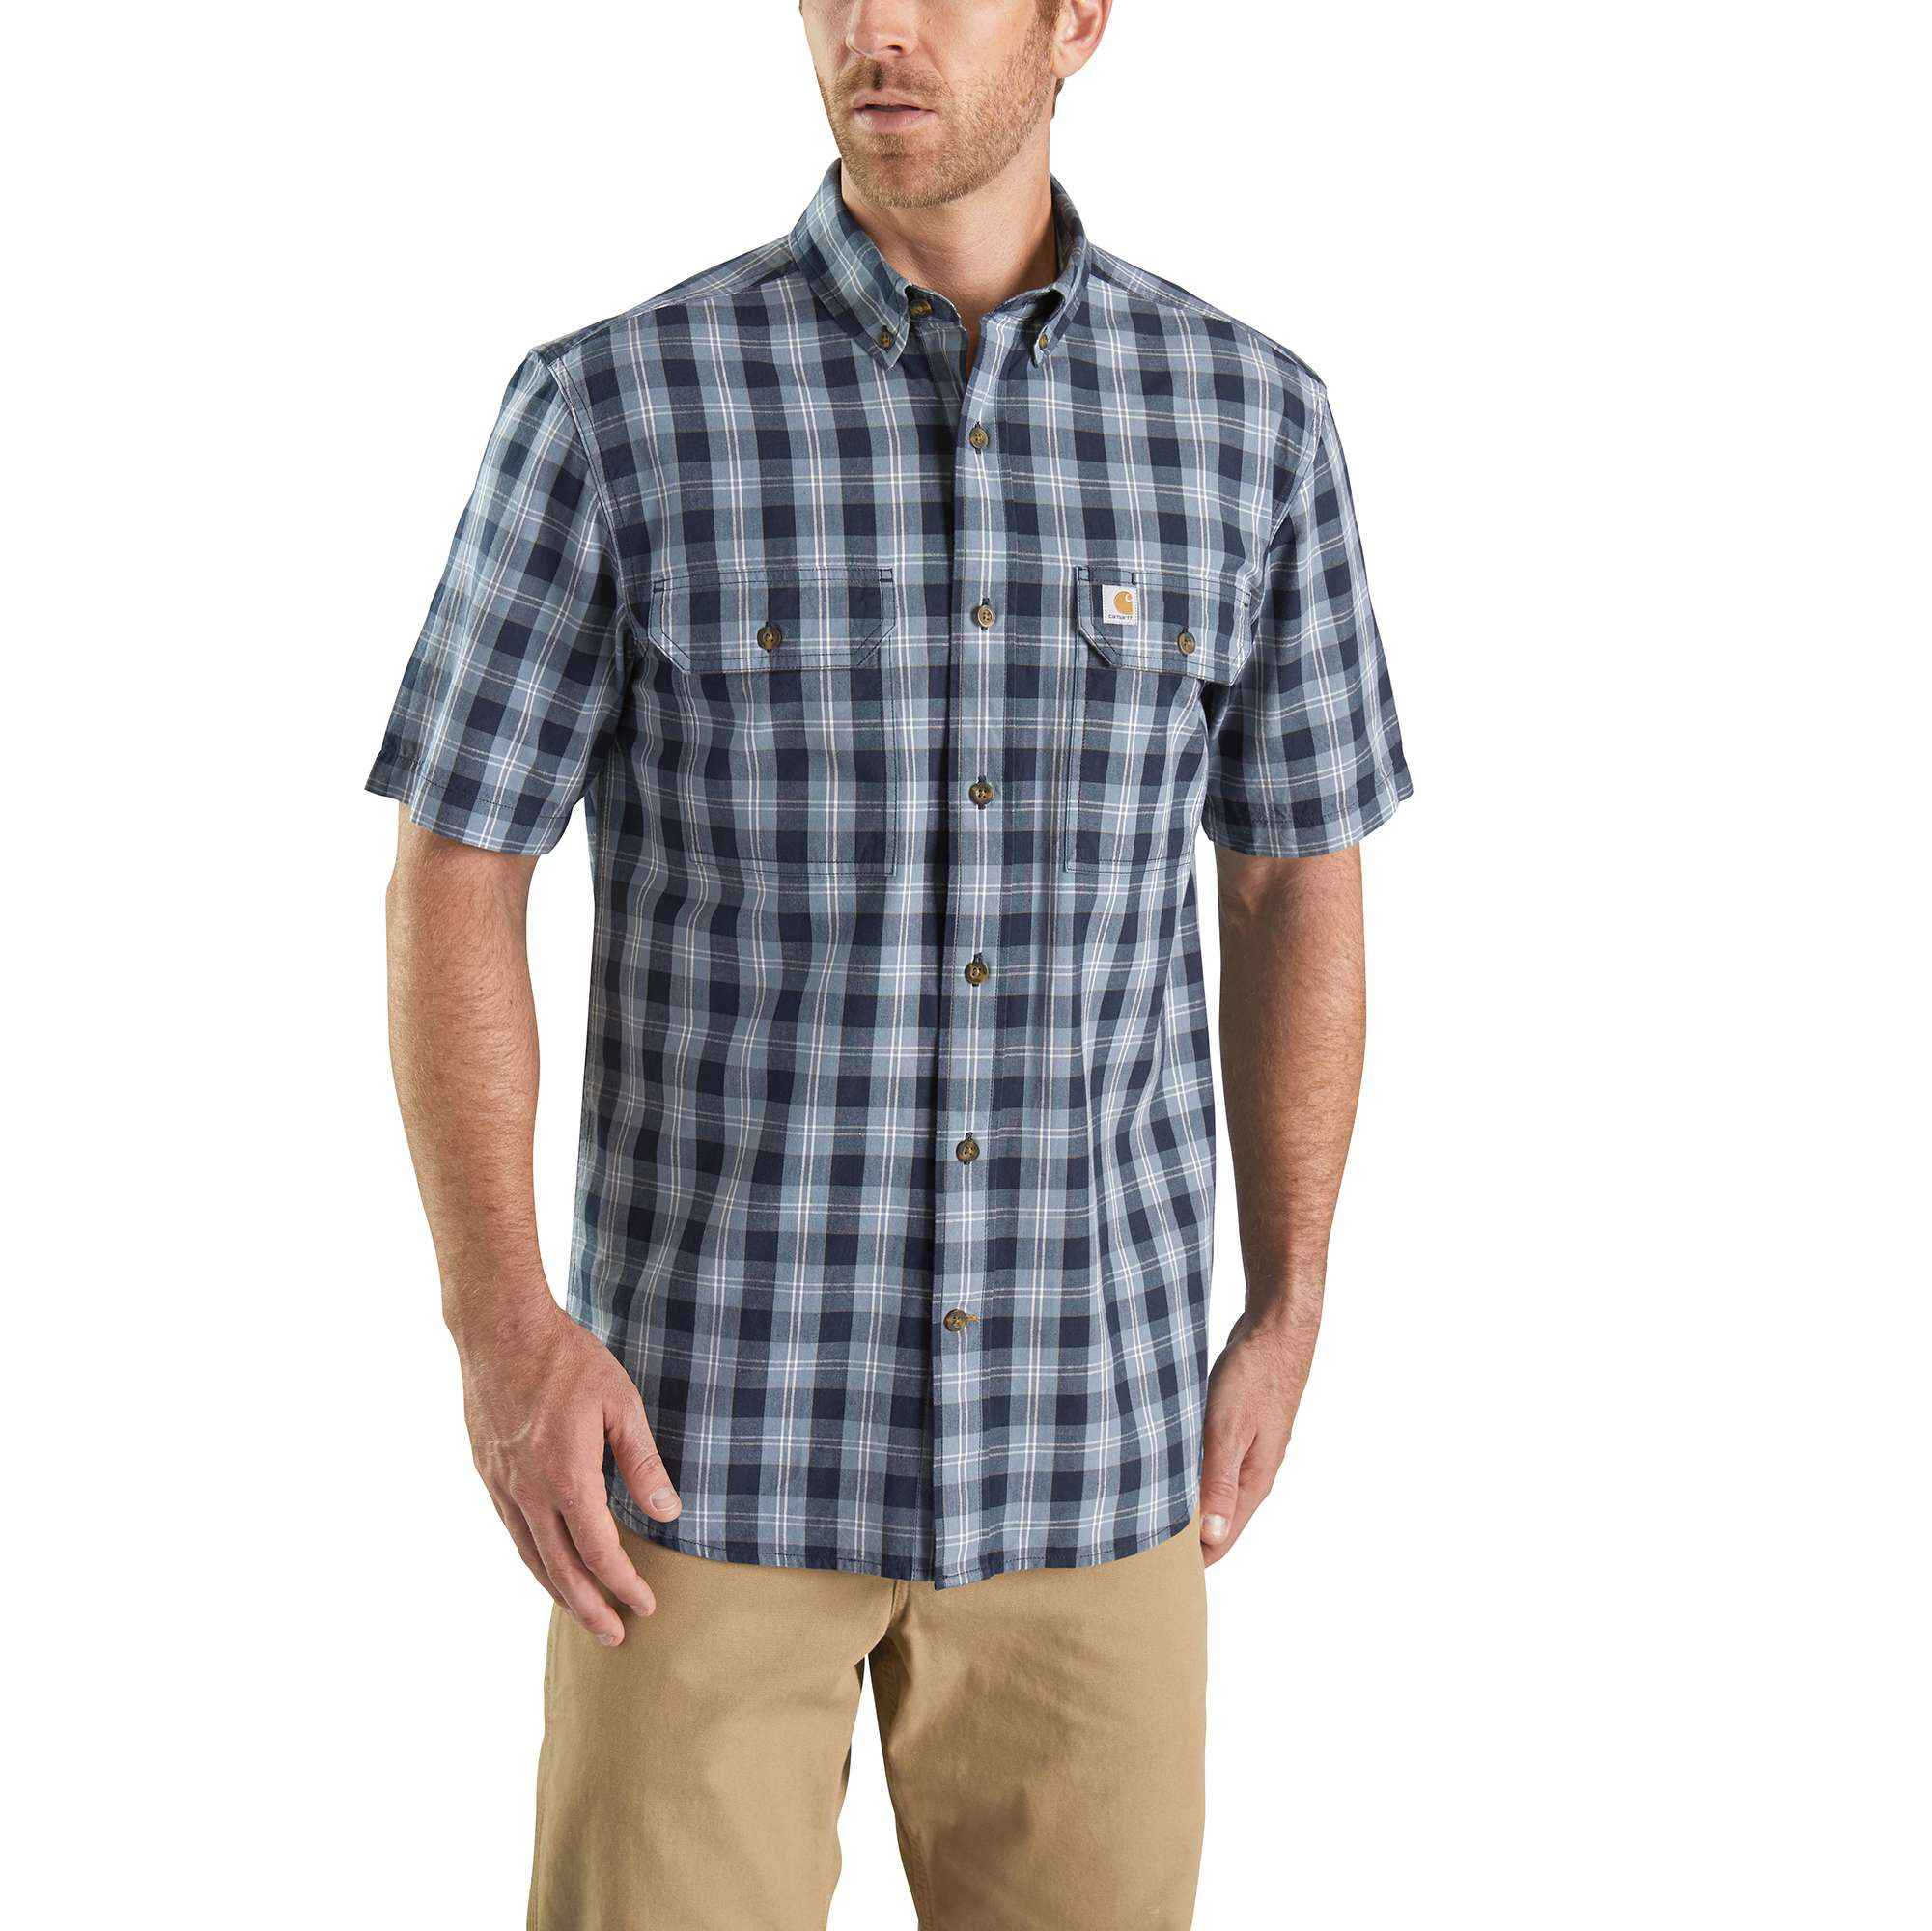 Men's Fort Plaid Chambray Short Sleeve Shirt Tall, Navy, swatch